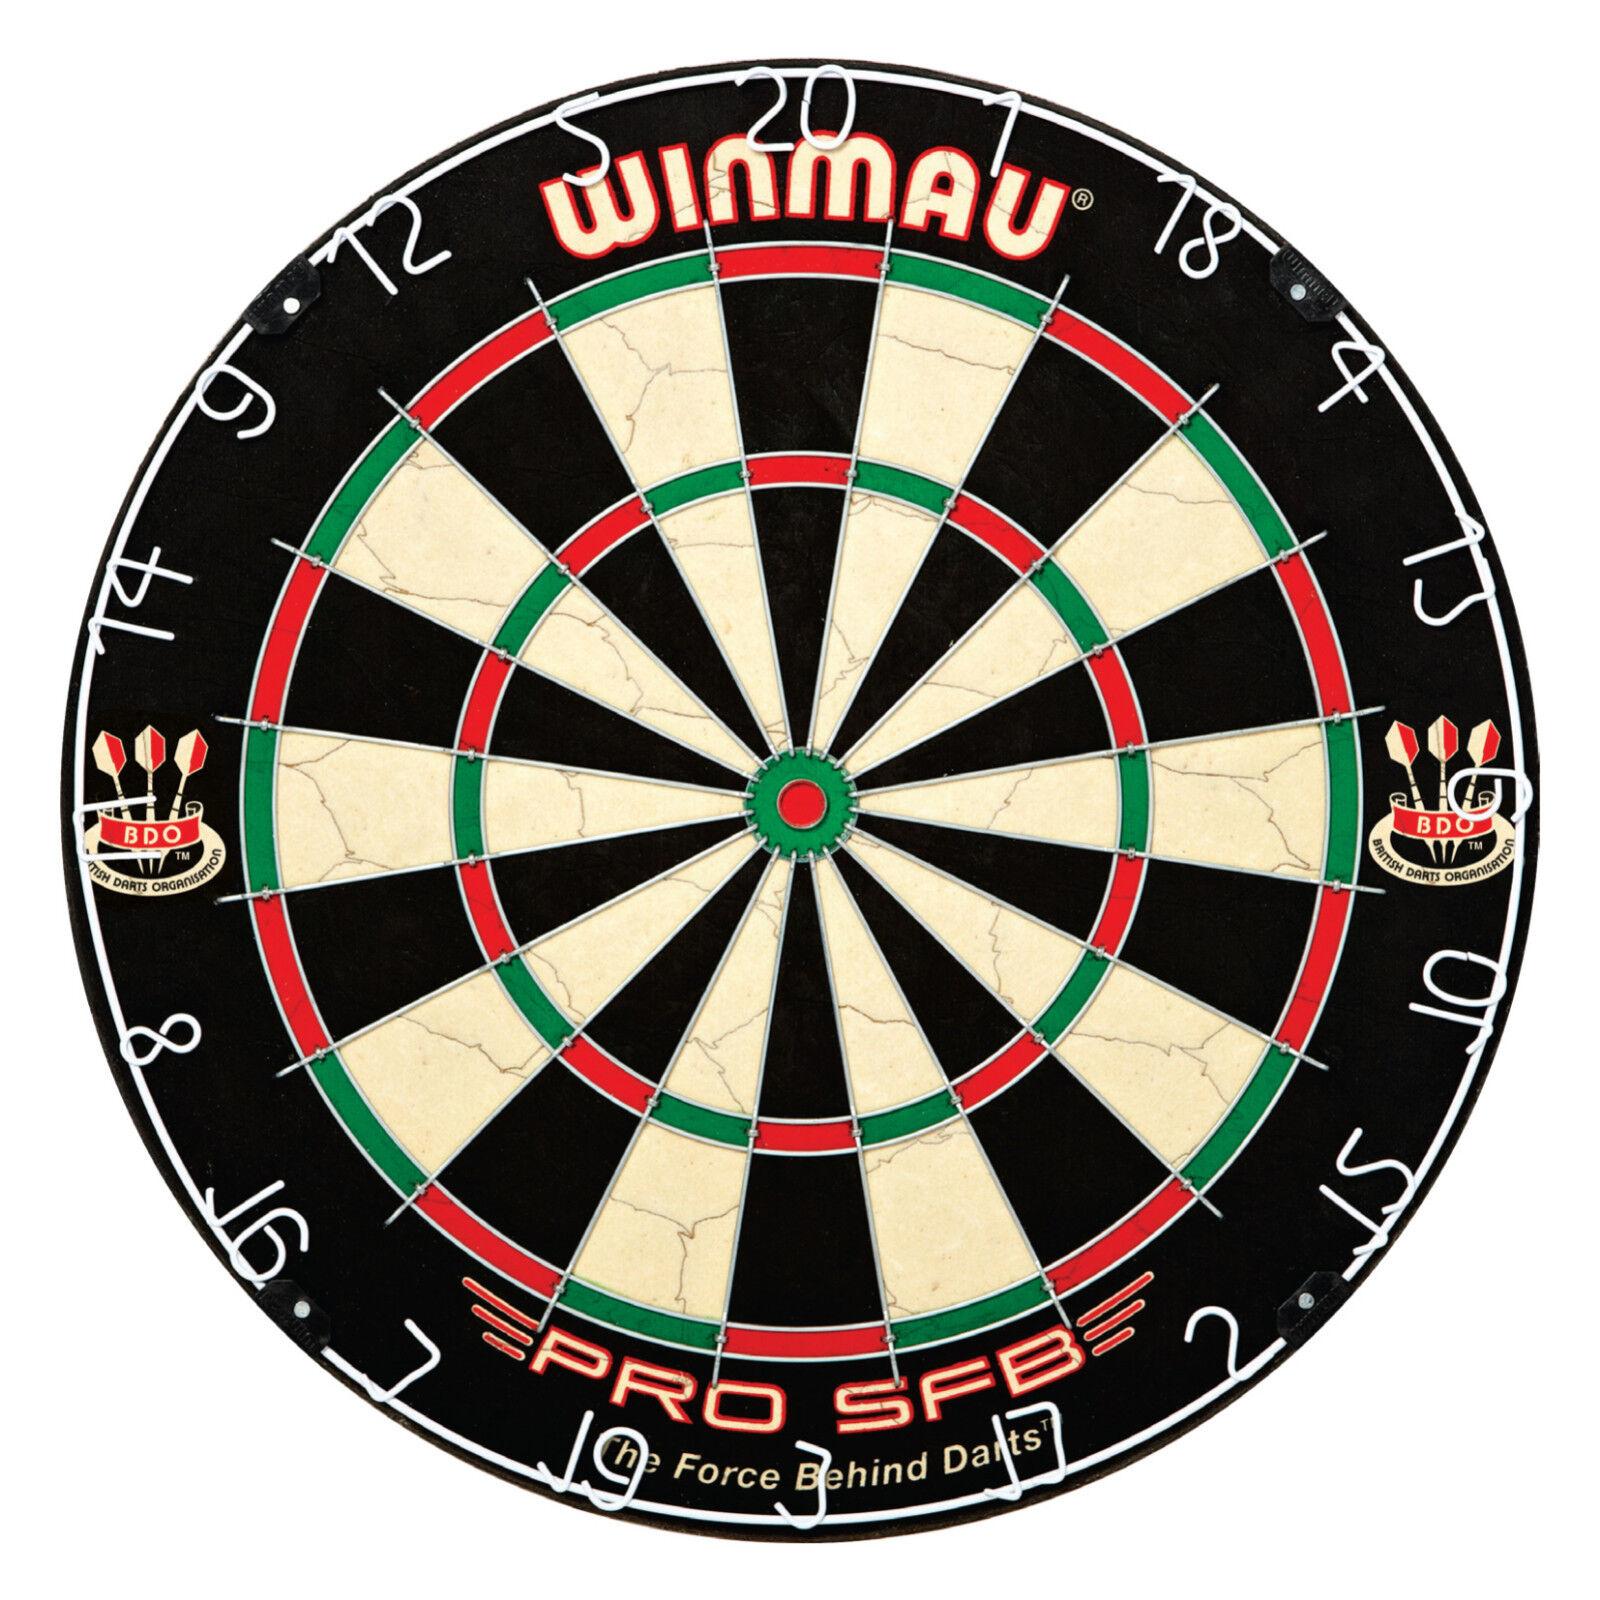 Winmau Board - Pro SFB Dartboard Dartscheibe Dart (Steel Dart) NEU